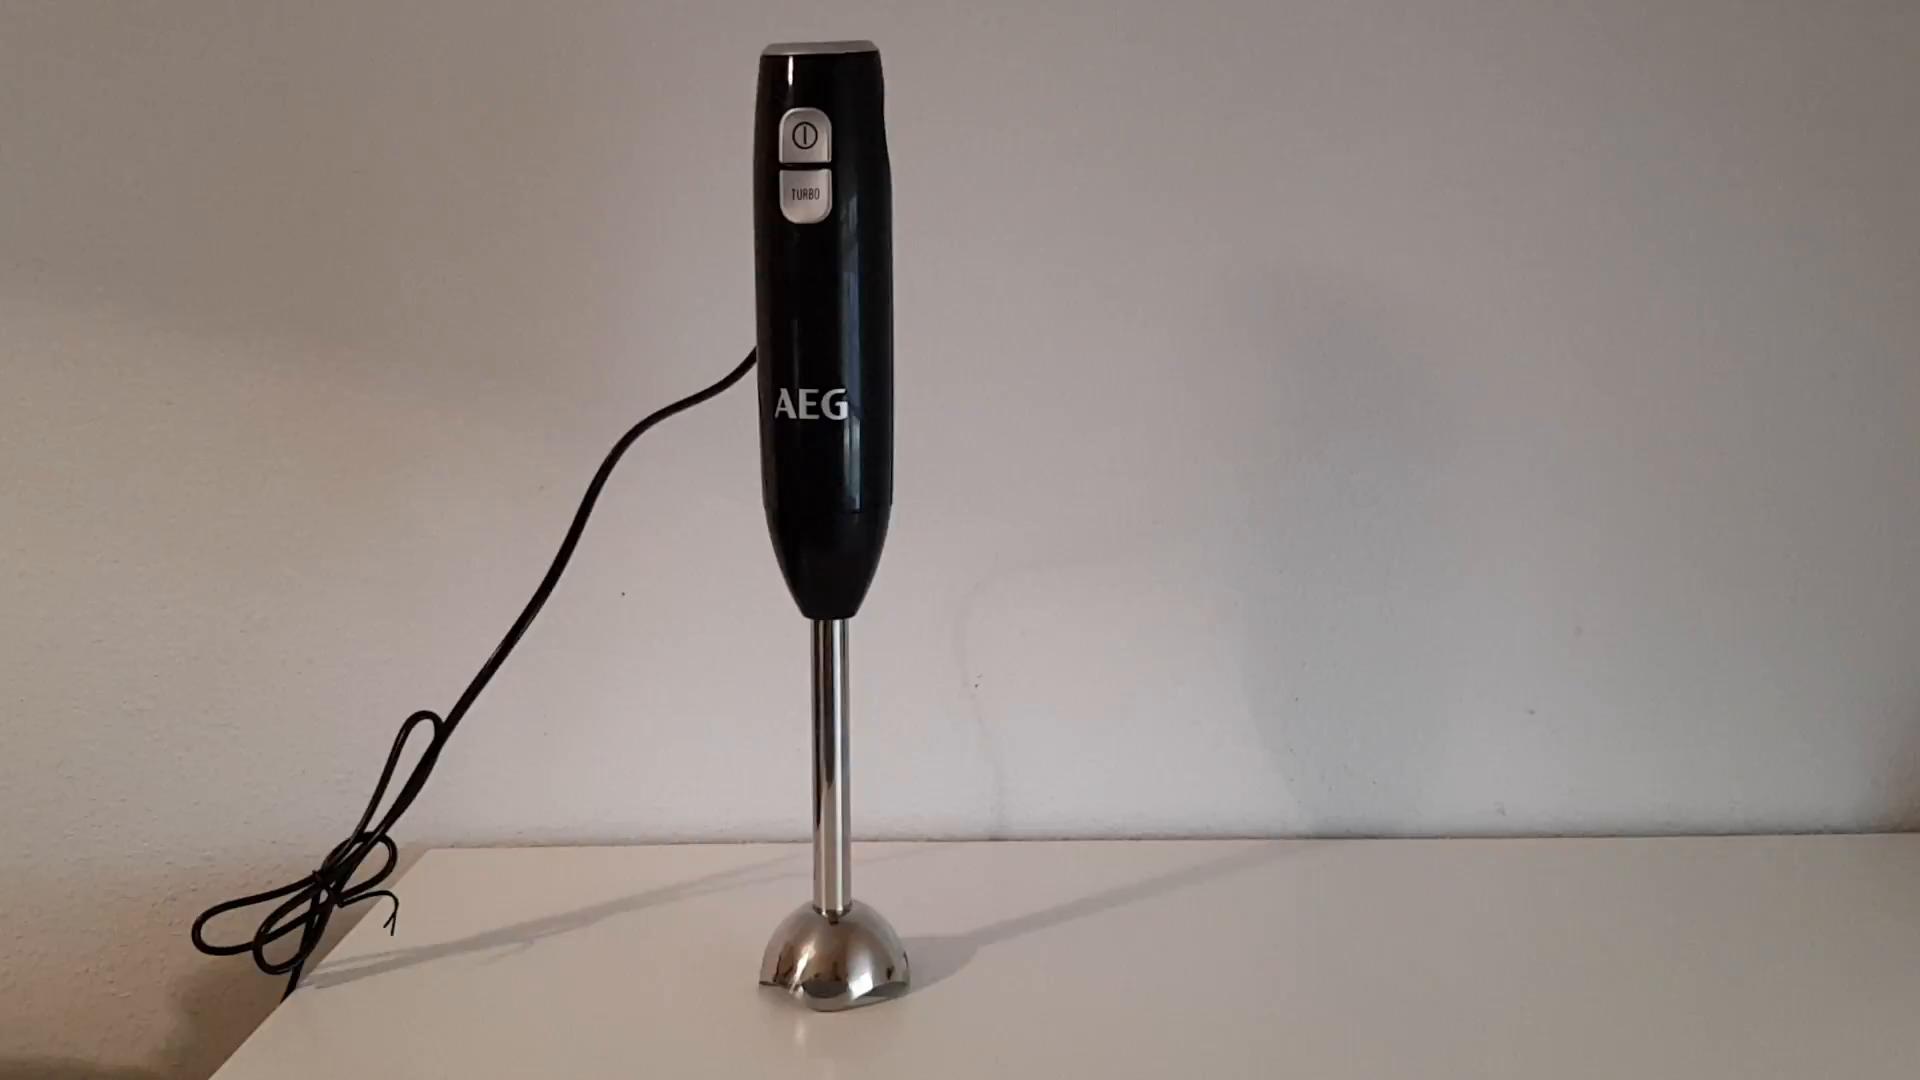 AEG STM3400 Batidora de mano, 600W, 2 velocidades, 85dB, pie de metal, múltiples accesorios: Amazon.es: Hogar